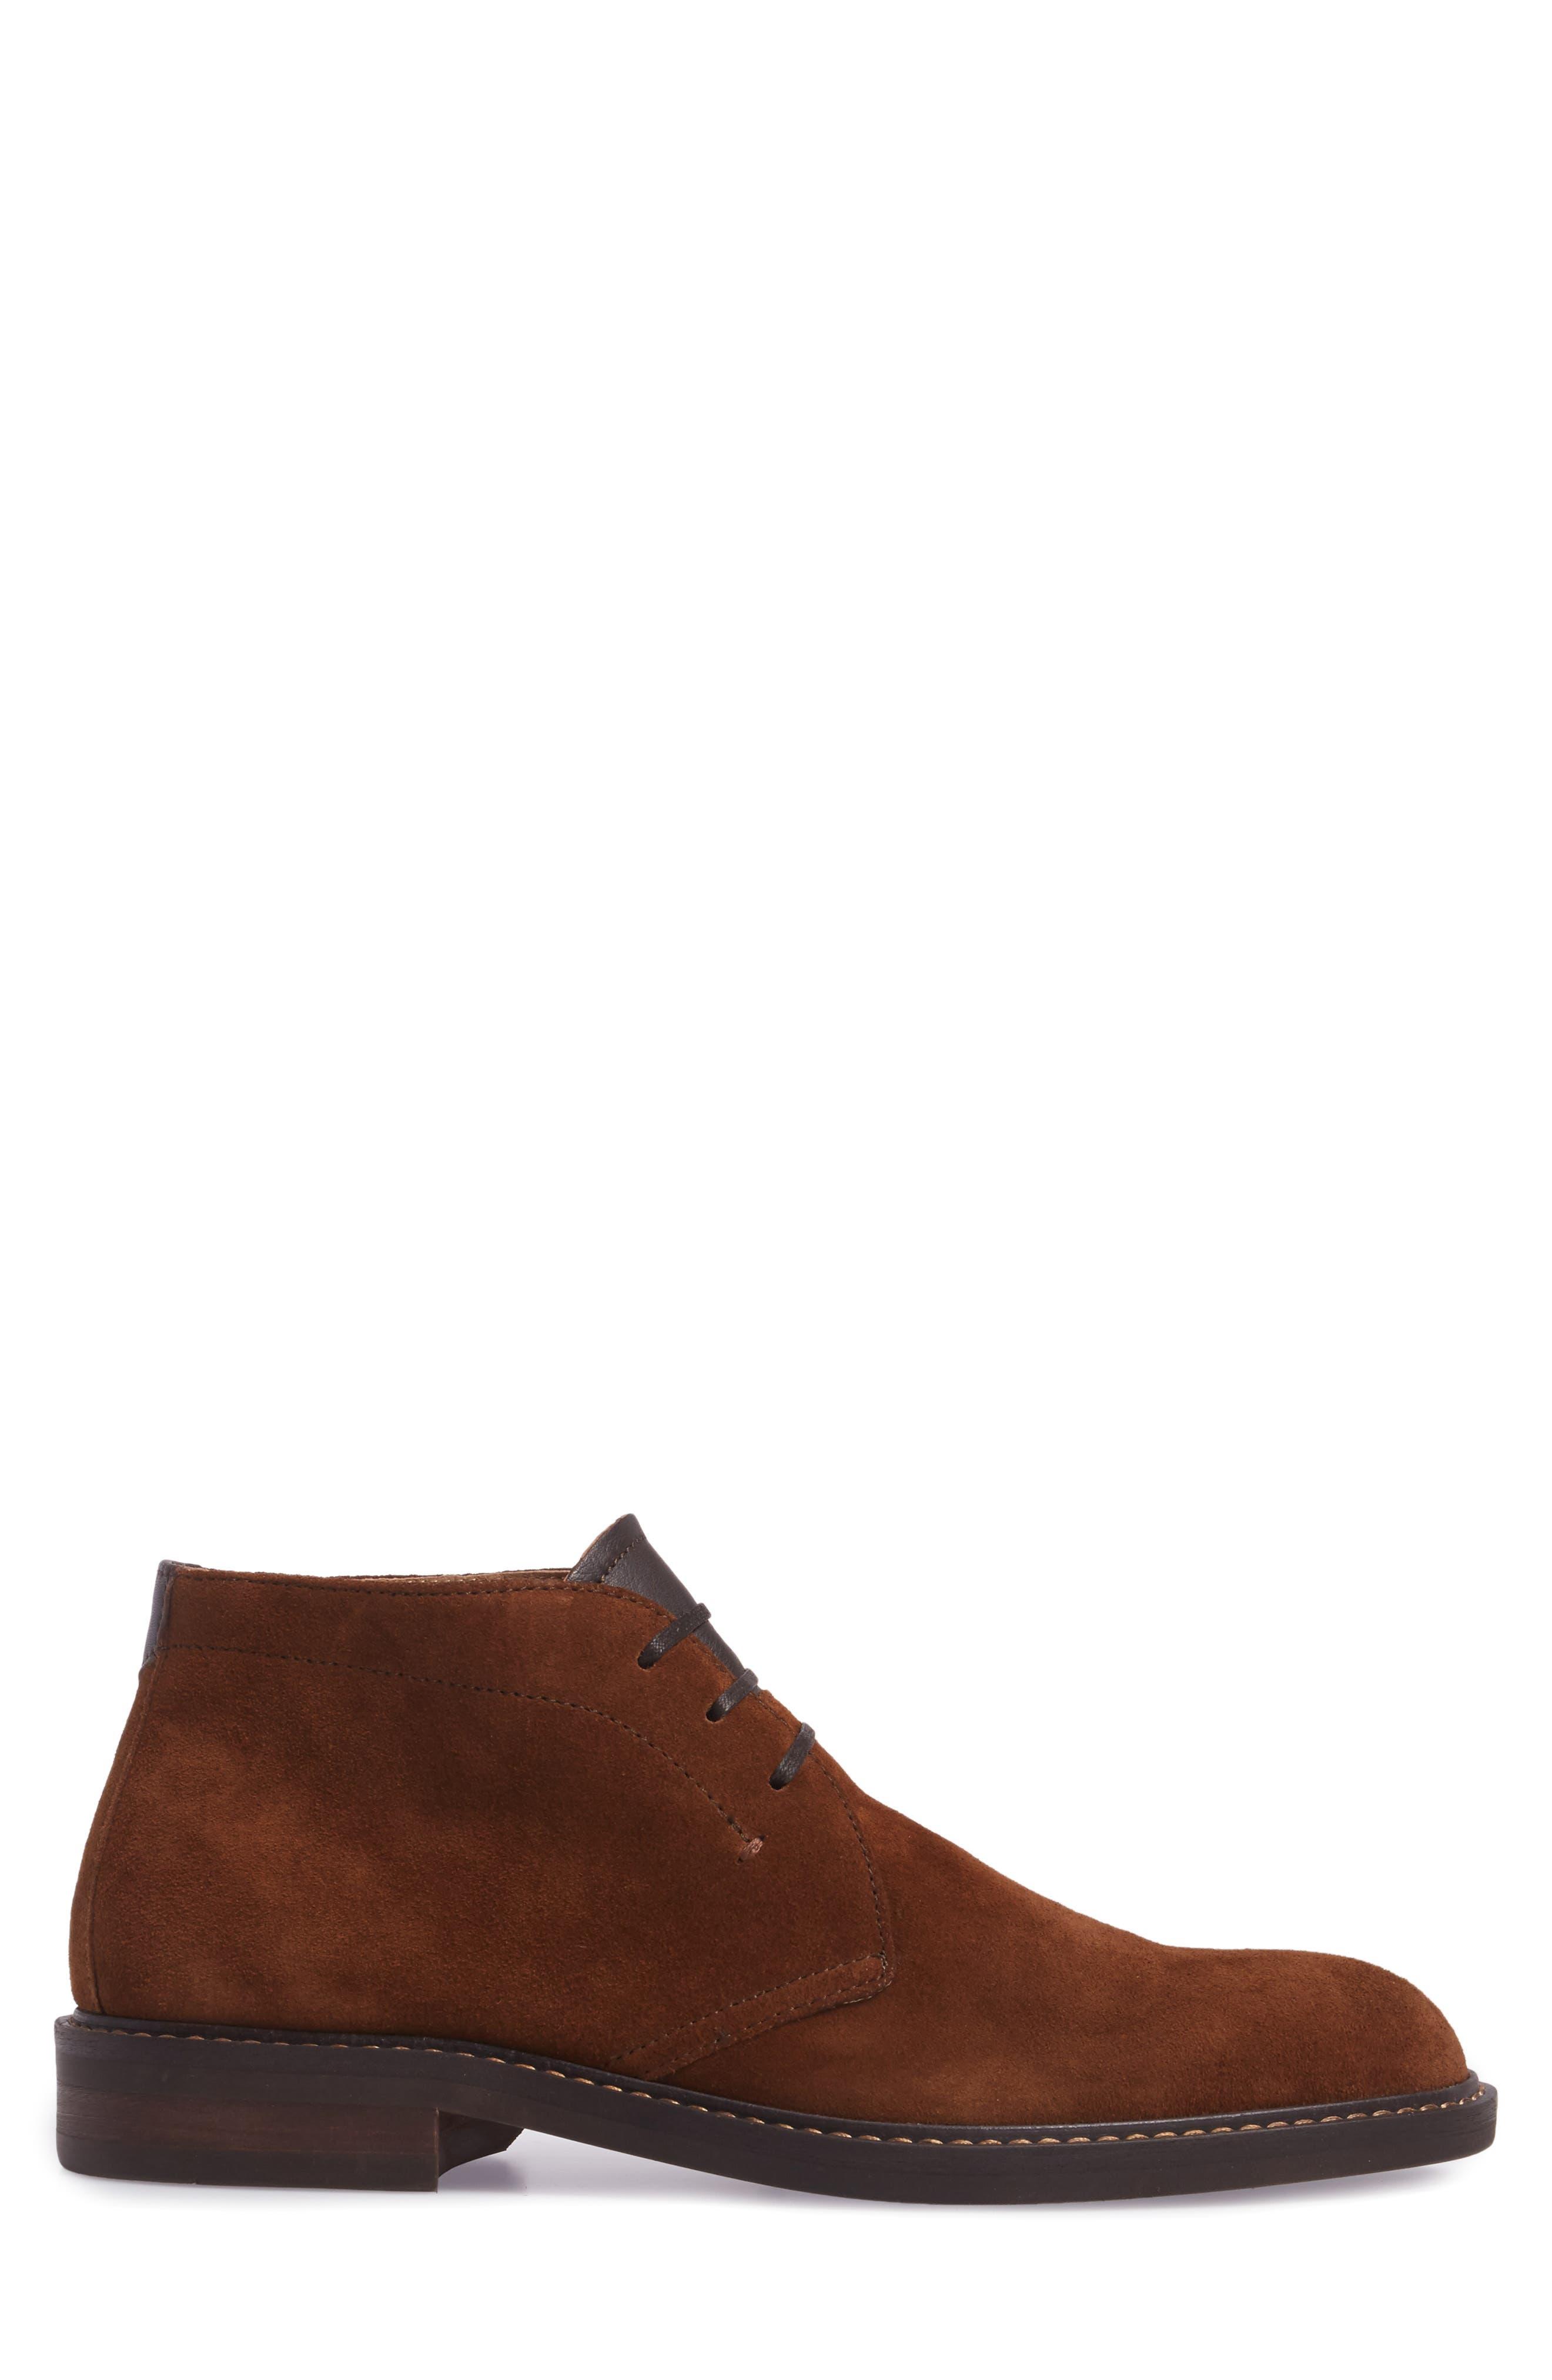 Barrett Chukka Boot,                             Alternate thumbnail 33, color,